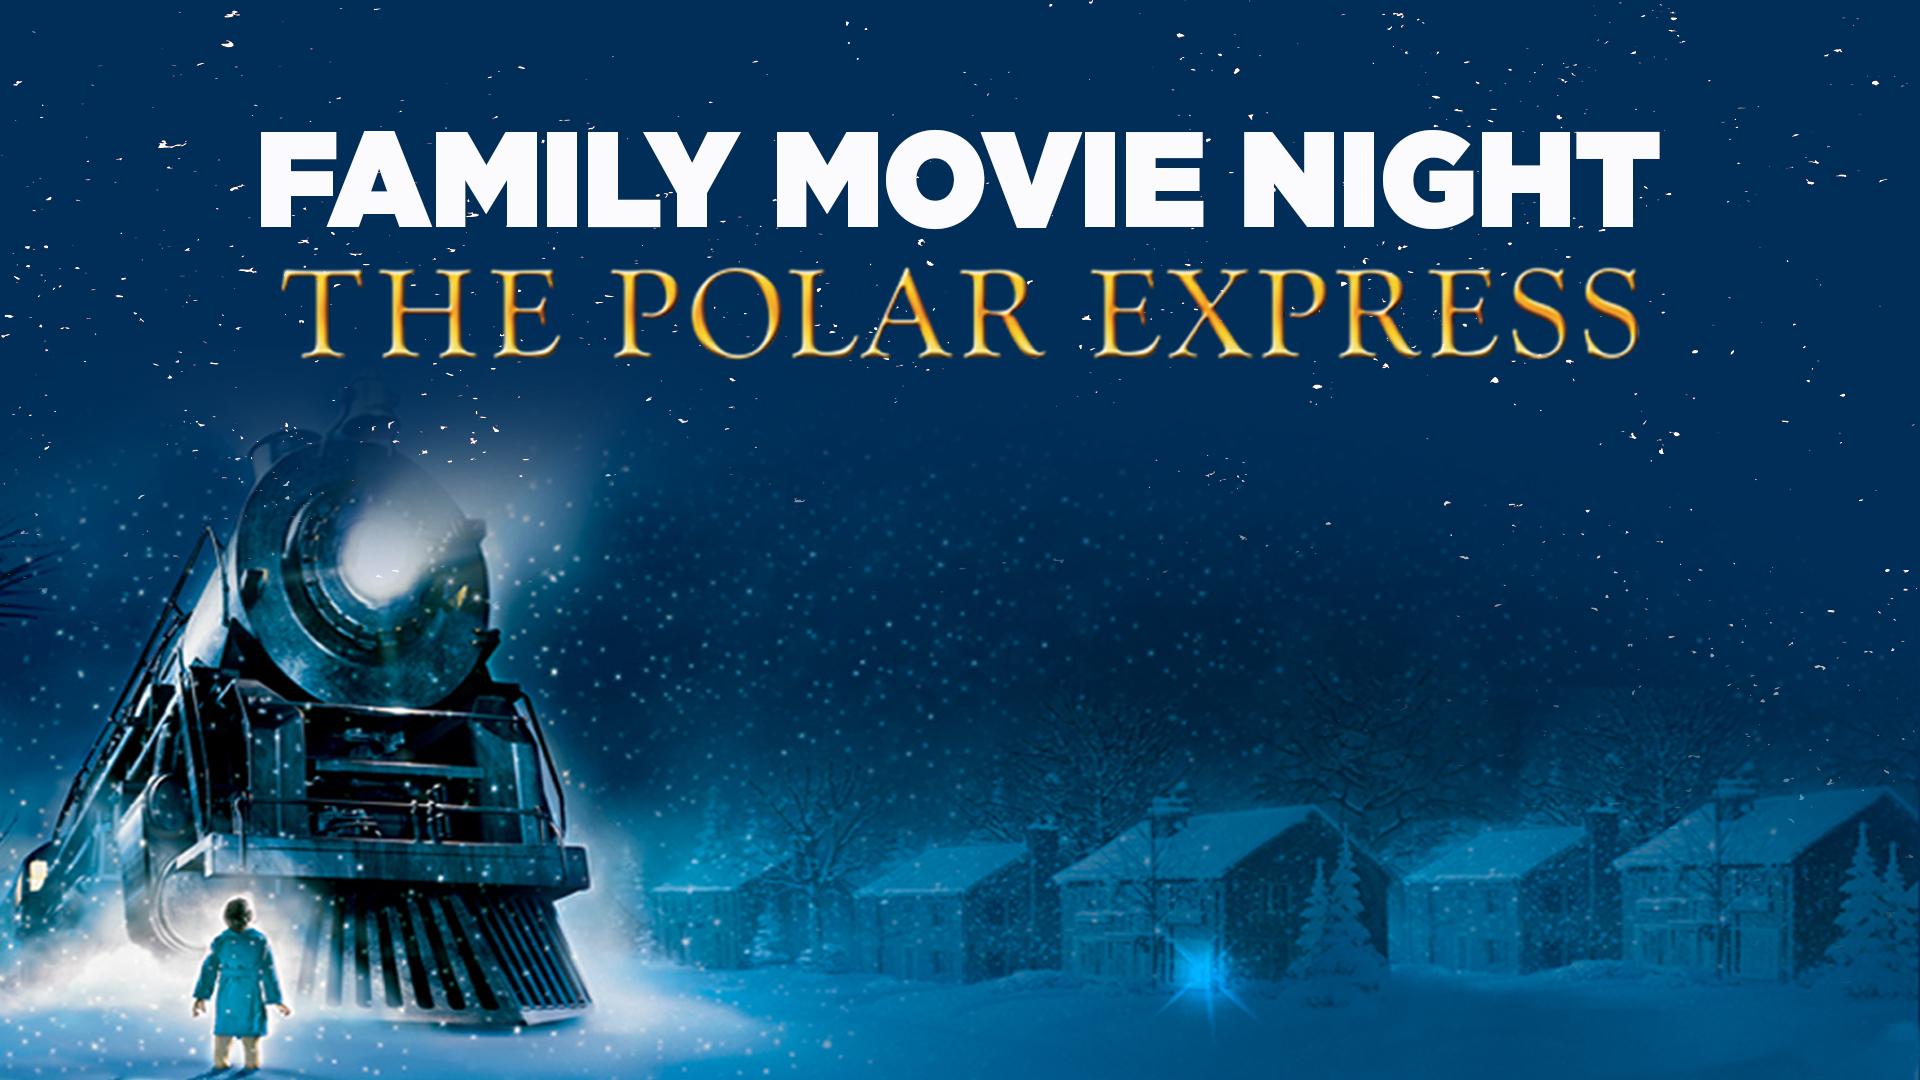 Polar Express Movie Night at Grace Church